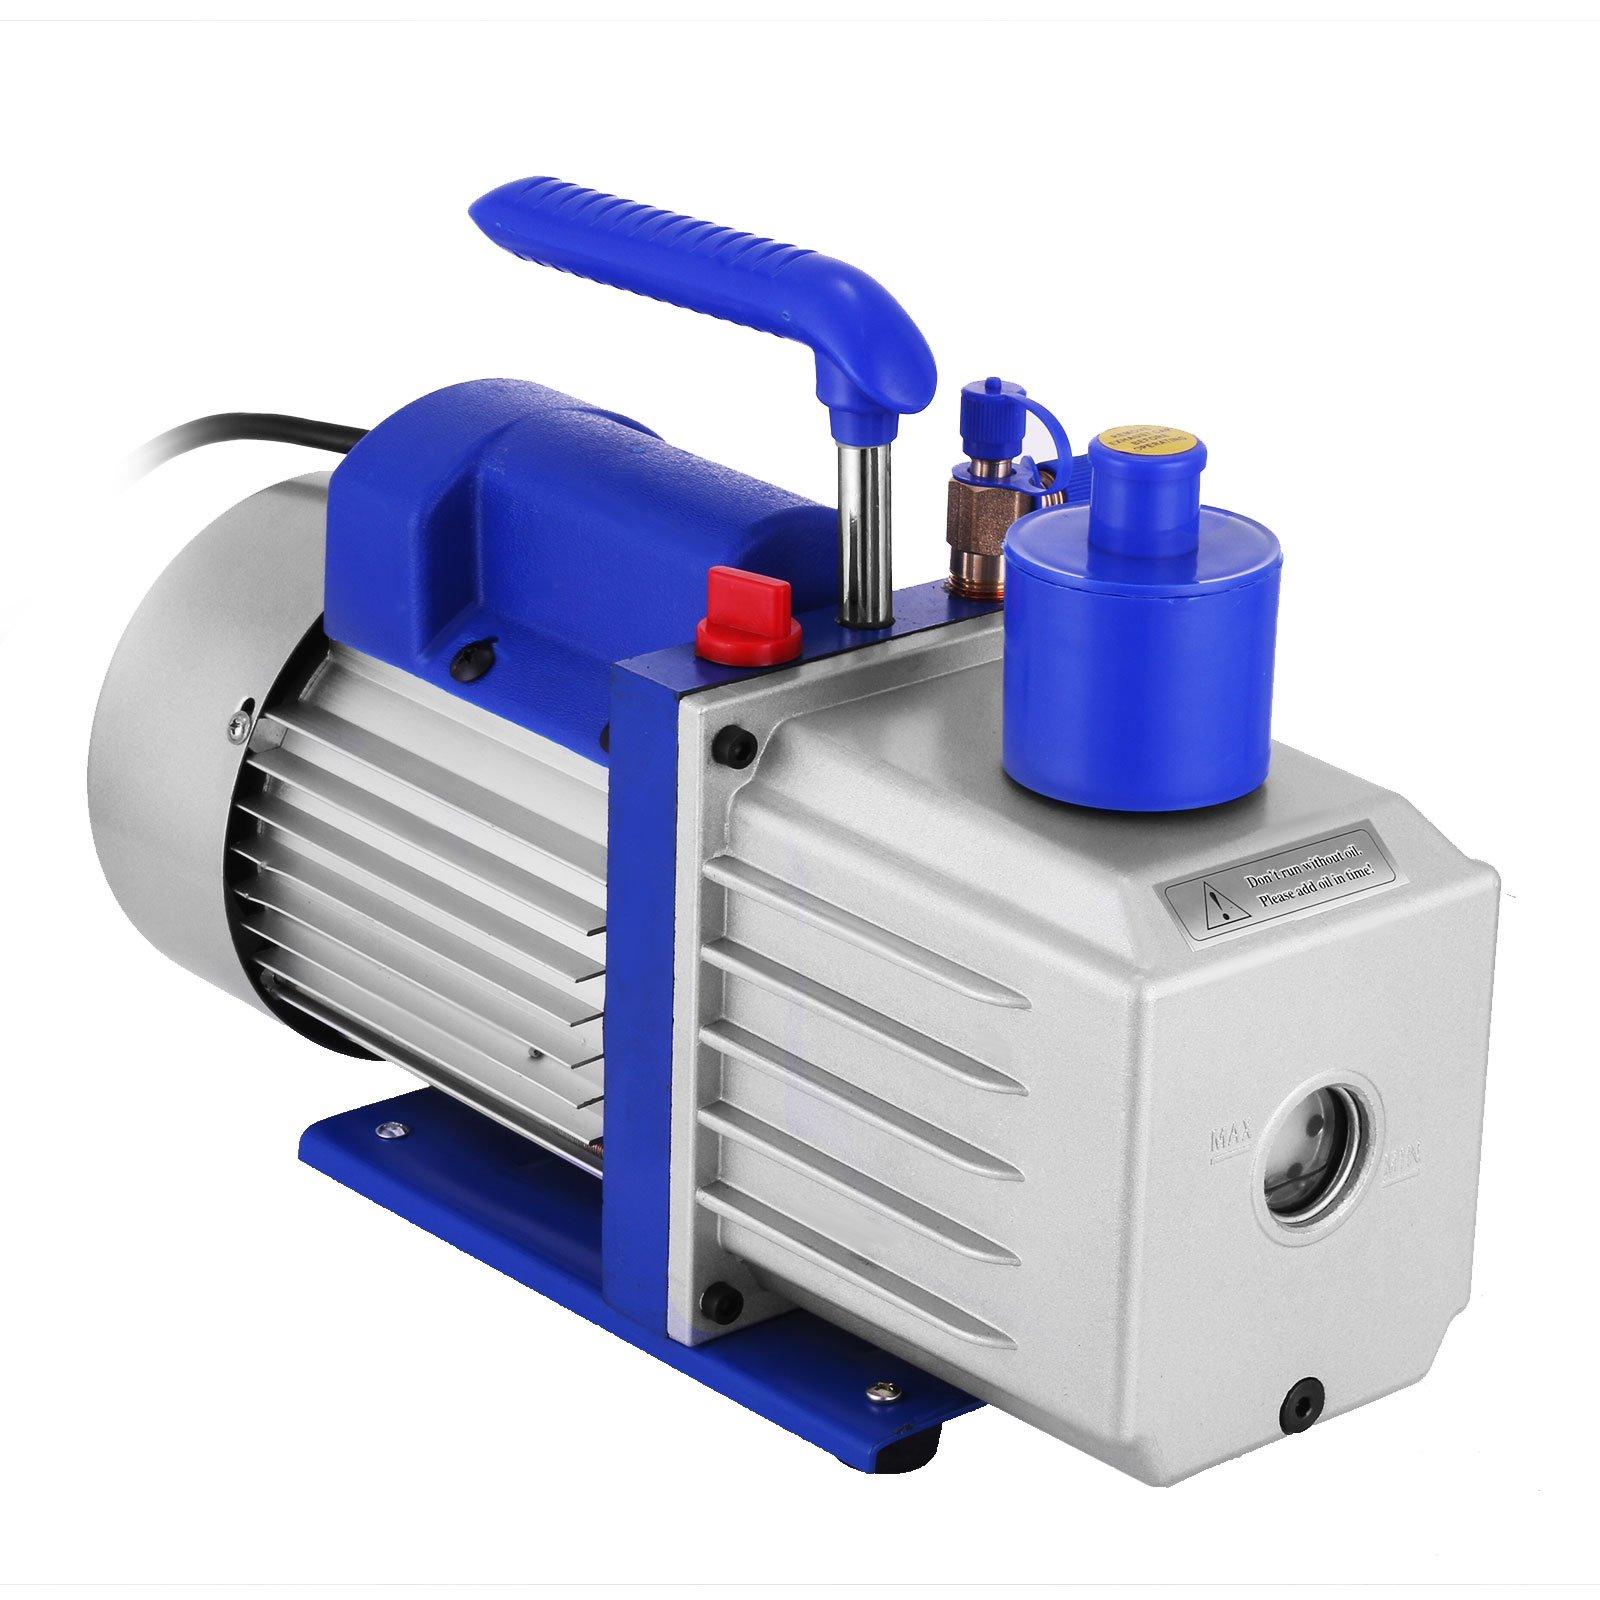 VEVOR Vacuum Pump 9CFM 1HP Two Stage HVAC Rotary Vane Vacuum Pump Wine Degassing Milking Medical Food Processing Air Conditioning Auto AC Refrigerant Vacuum Pump (2-Stage, 9CFM) by VEVOR (Image #4)